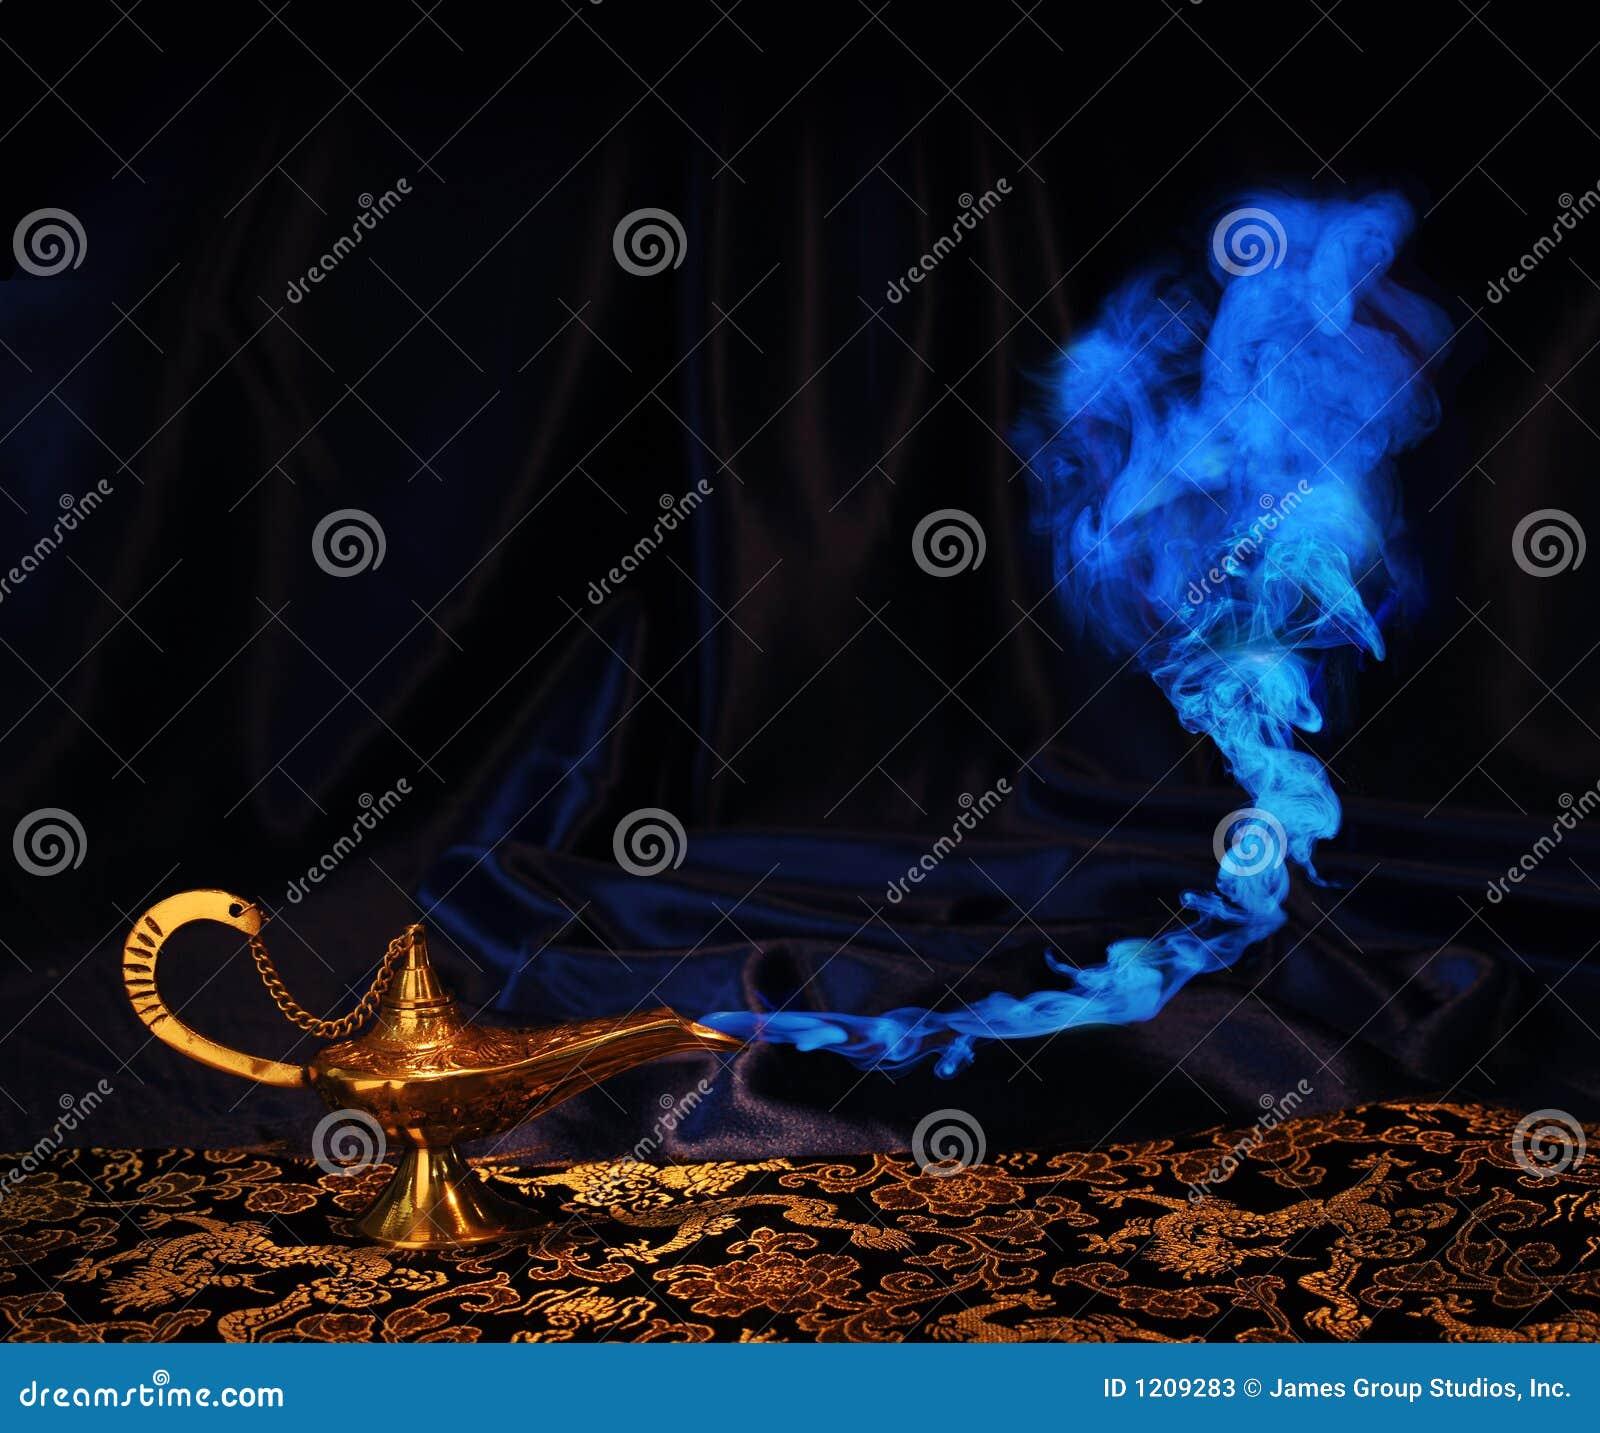 Aladdin Genie Lamp No Genie Stock Image Image 1209283